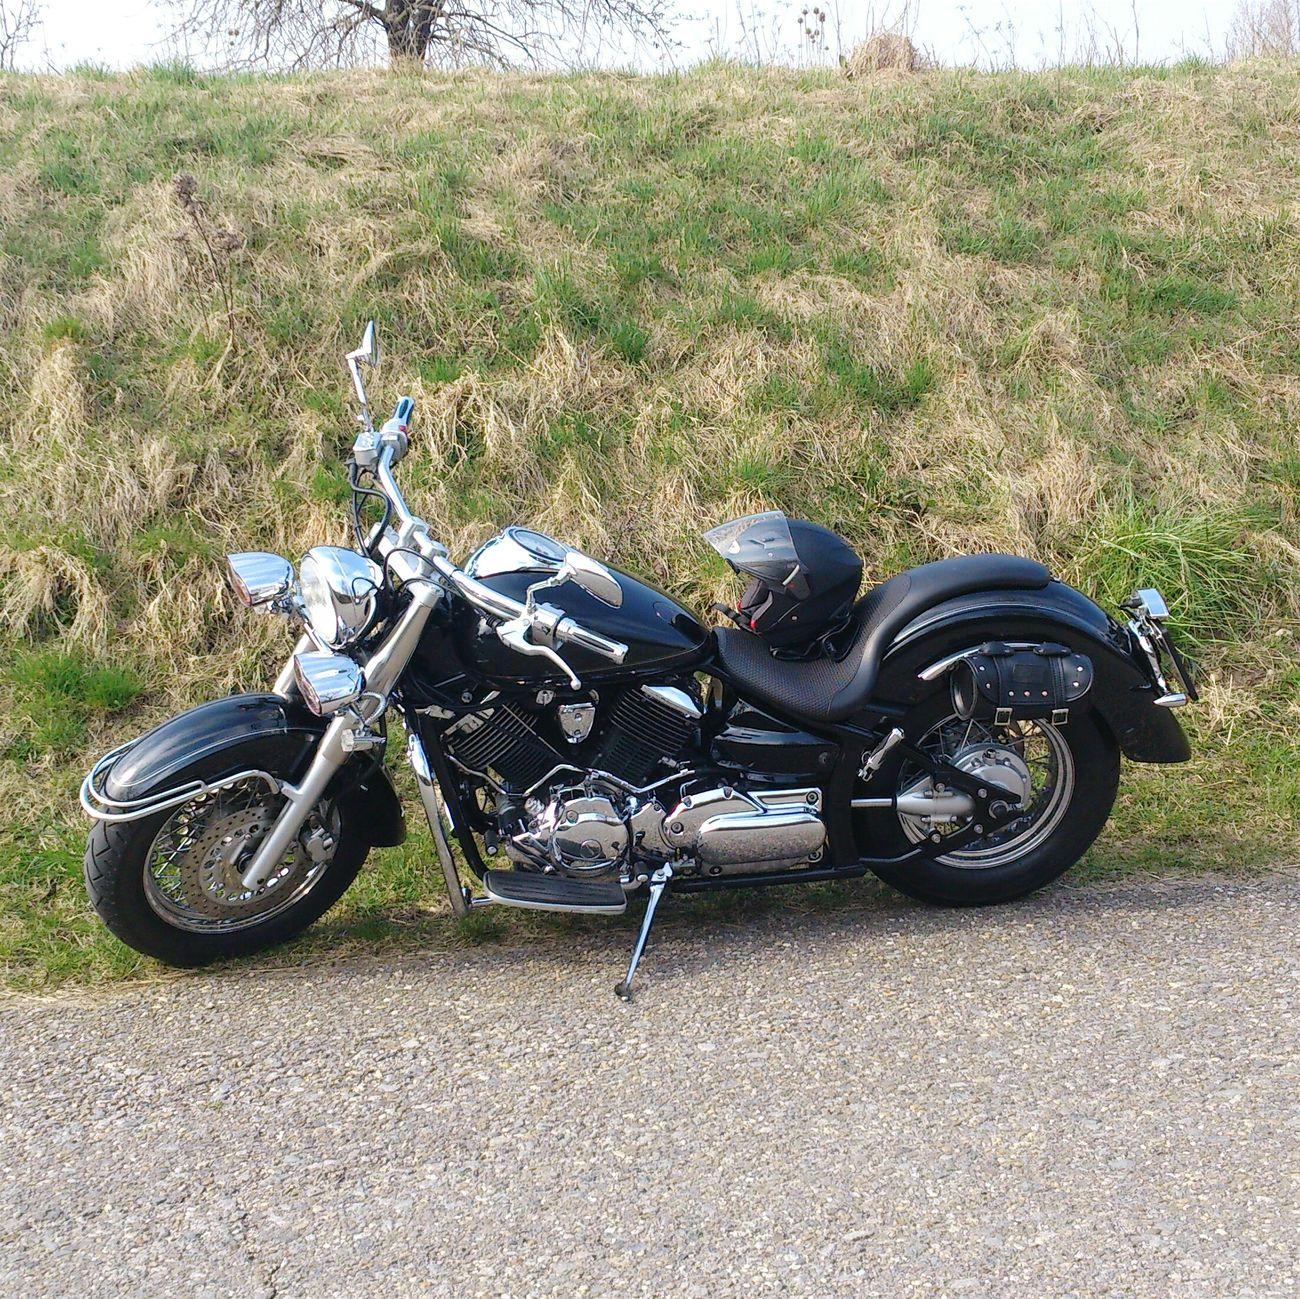 Motorcycle Motorcycles März2015 Motorrad Yamaha Drag Star Sturzhelm Cruiser